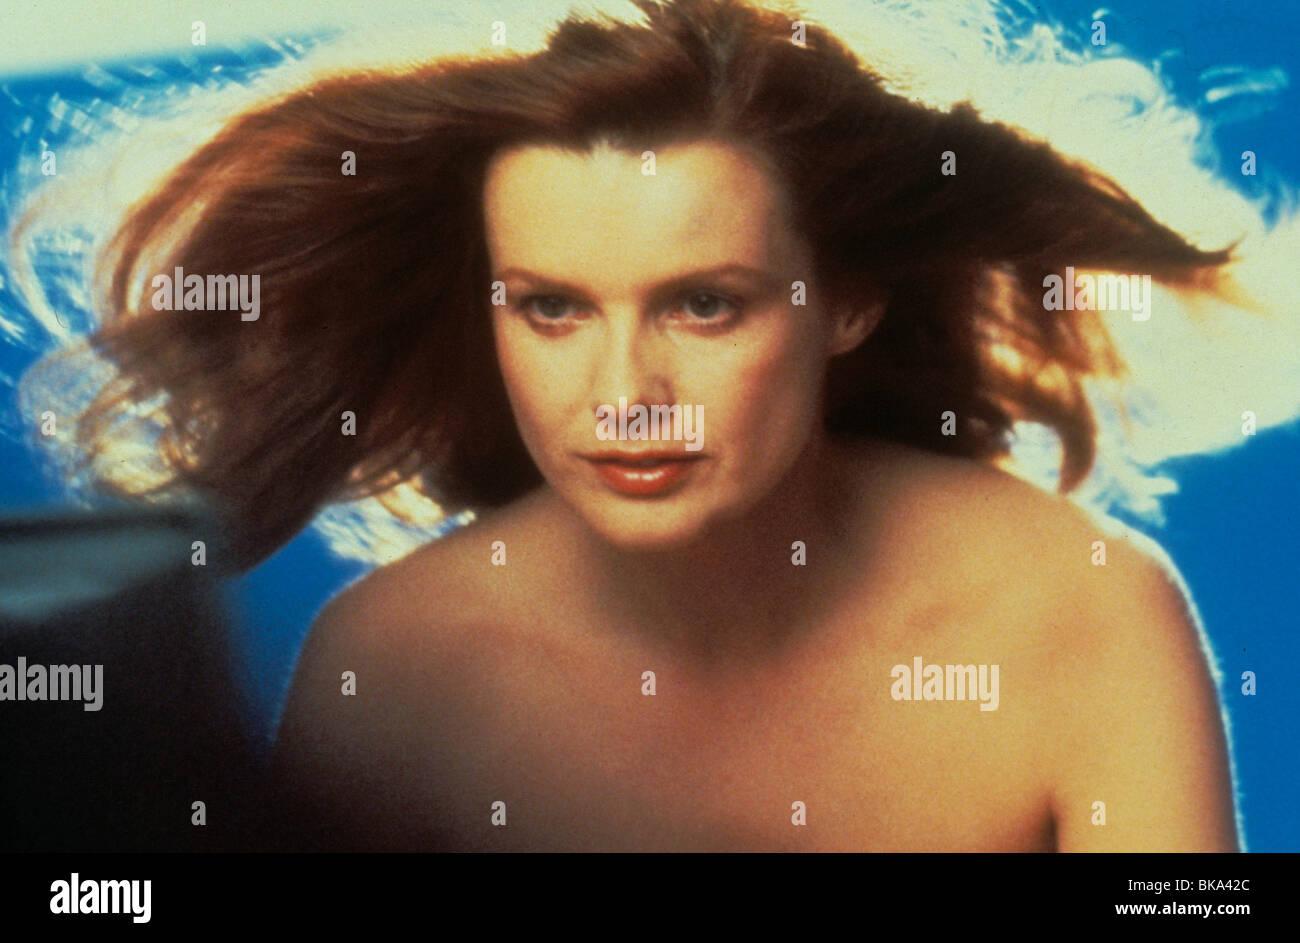 Fiona Mollison (born 1954),Rossana Martini Hot videos Bianca Umali (b. 2000),Kestie Morassi